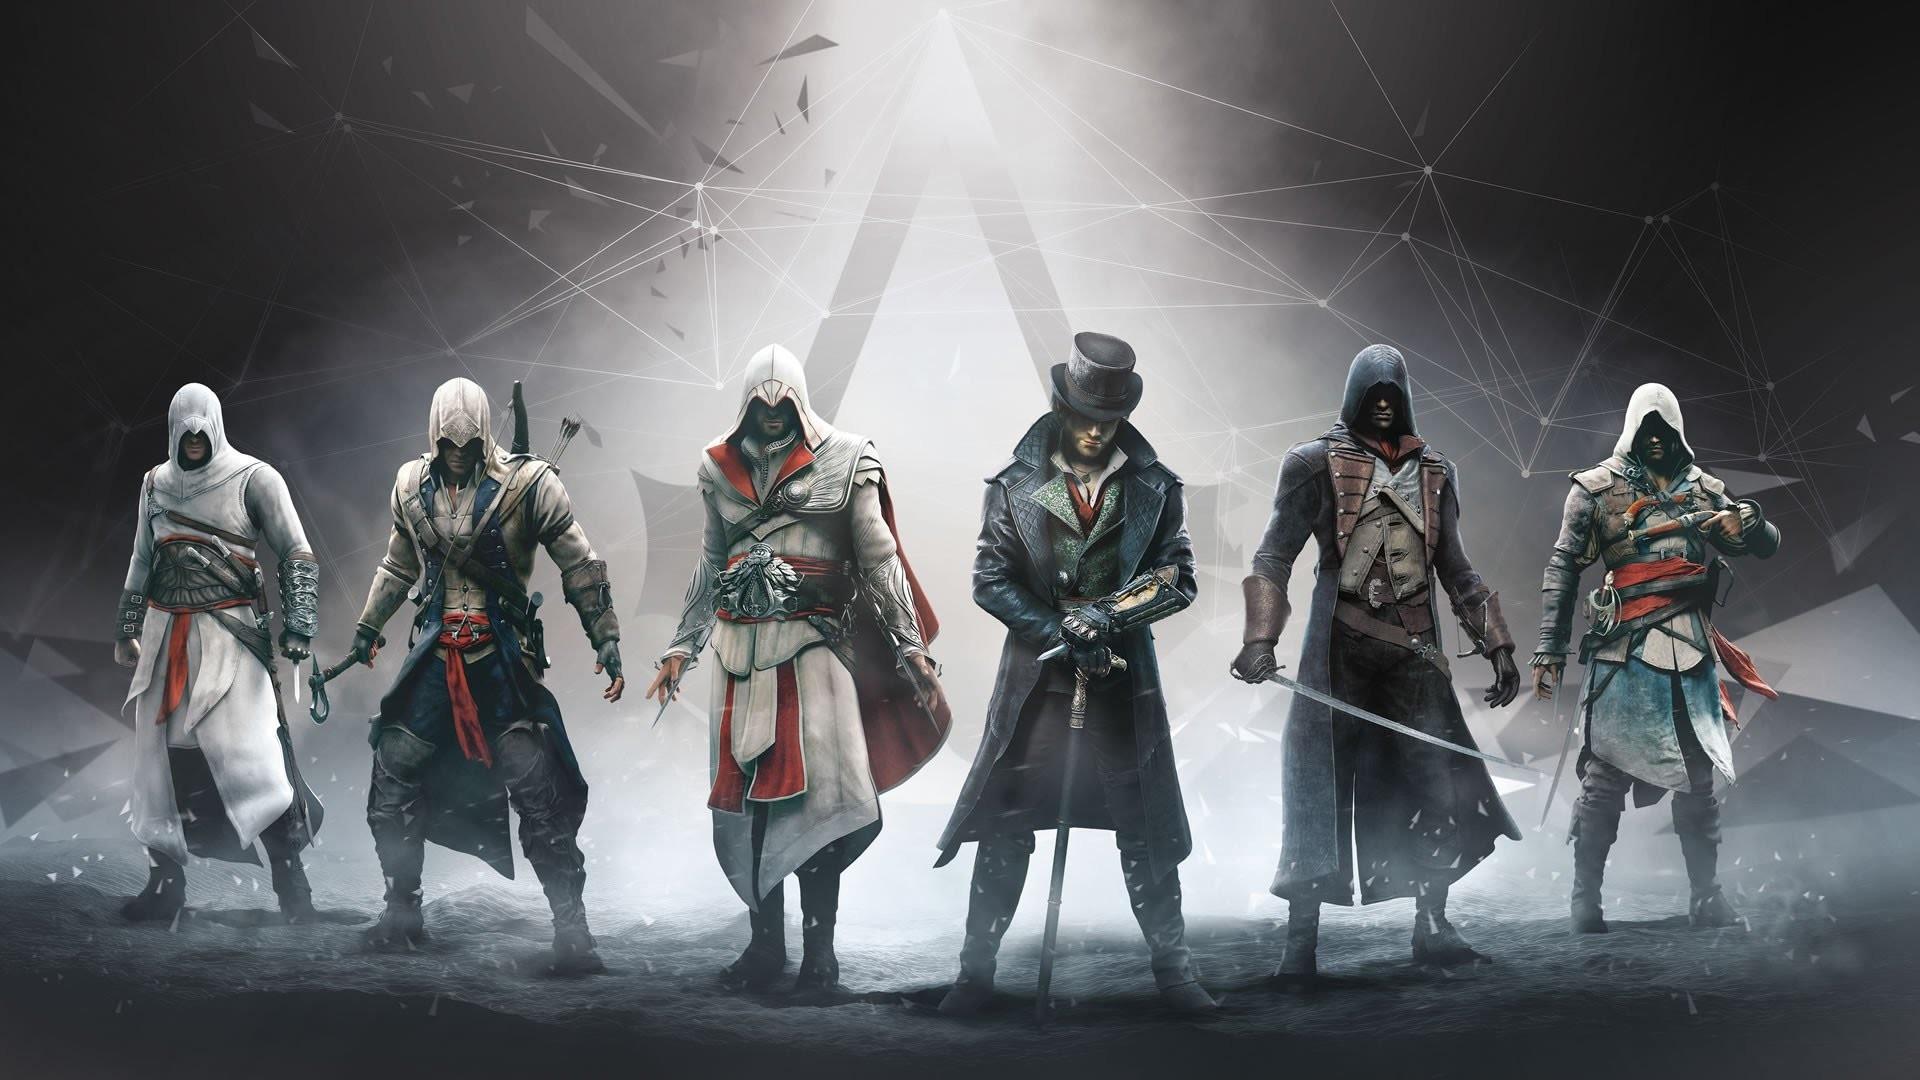 Assassin's Creed Wallpaper   Assassins creed wallpaper   Assassins creed  Story   #34